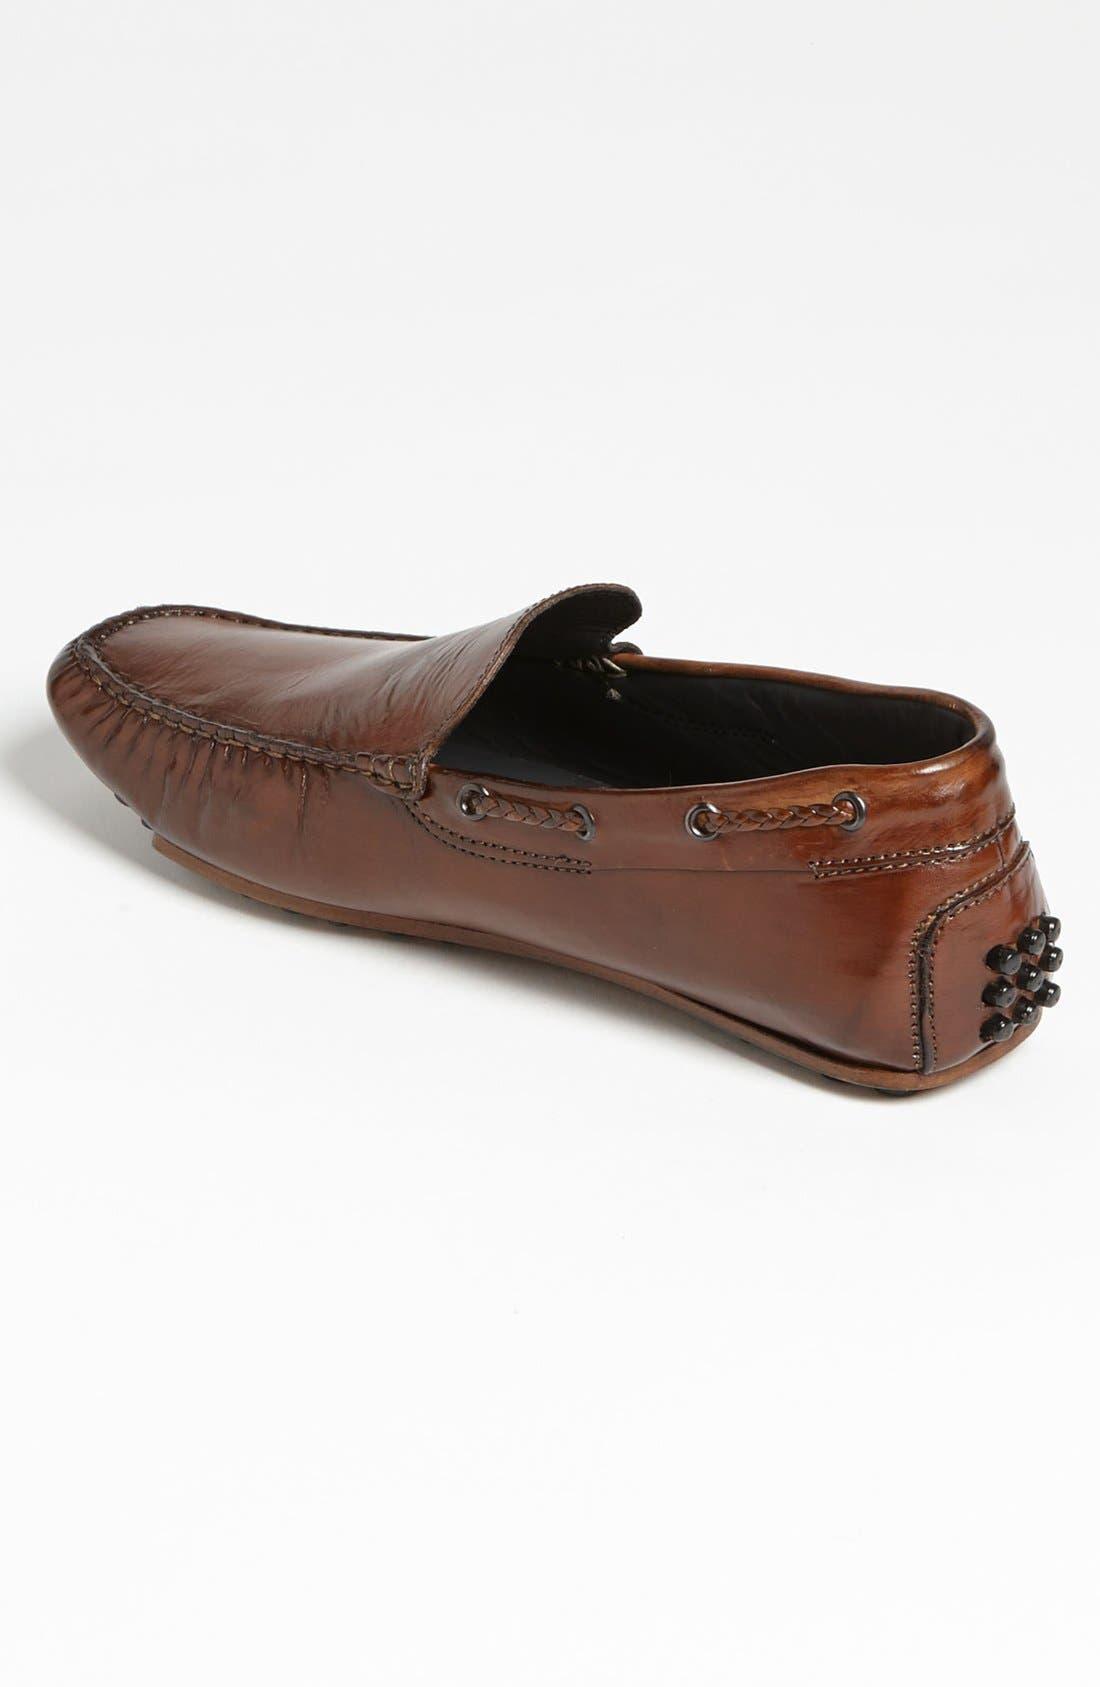 Alternate Image 2  - To Boot New York 'Trumball' Driving Shoe